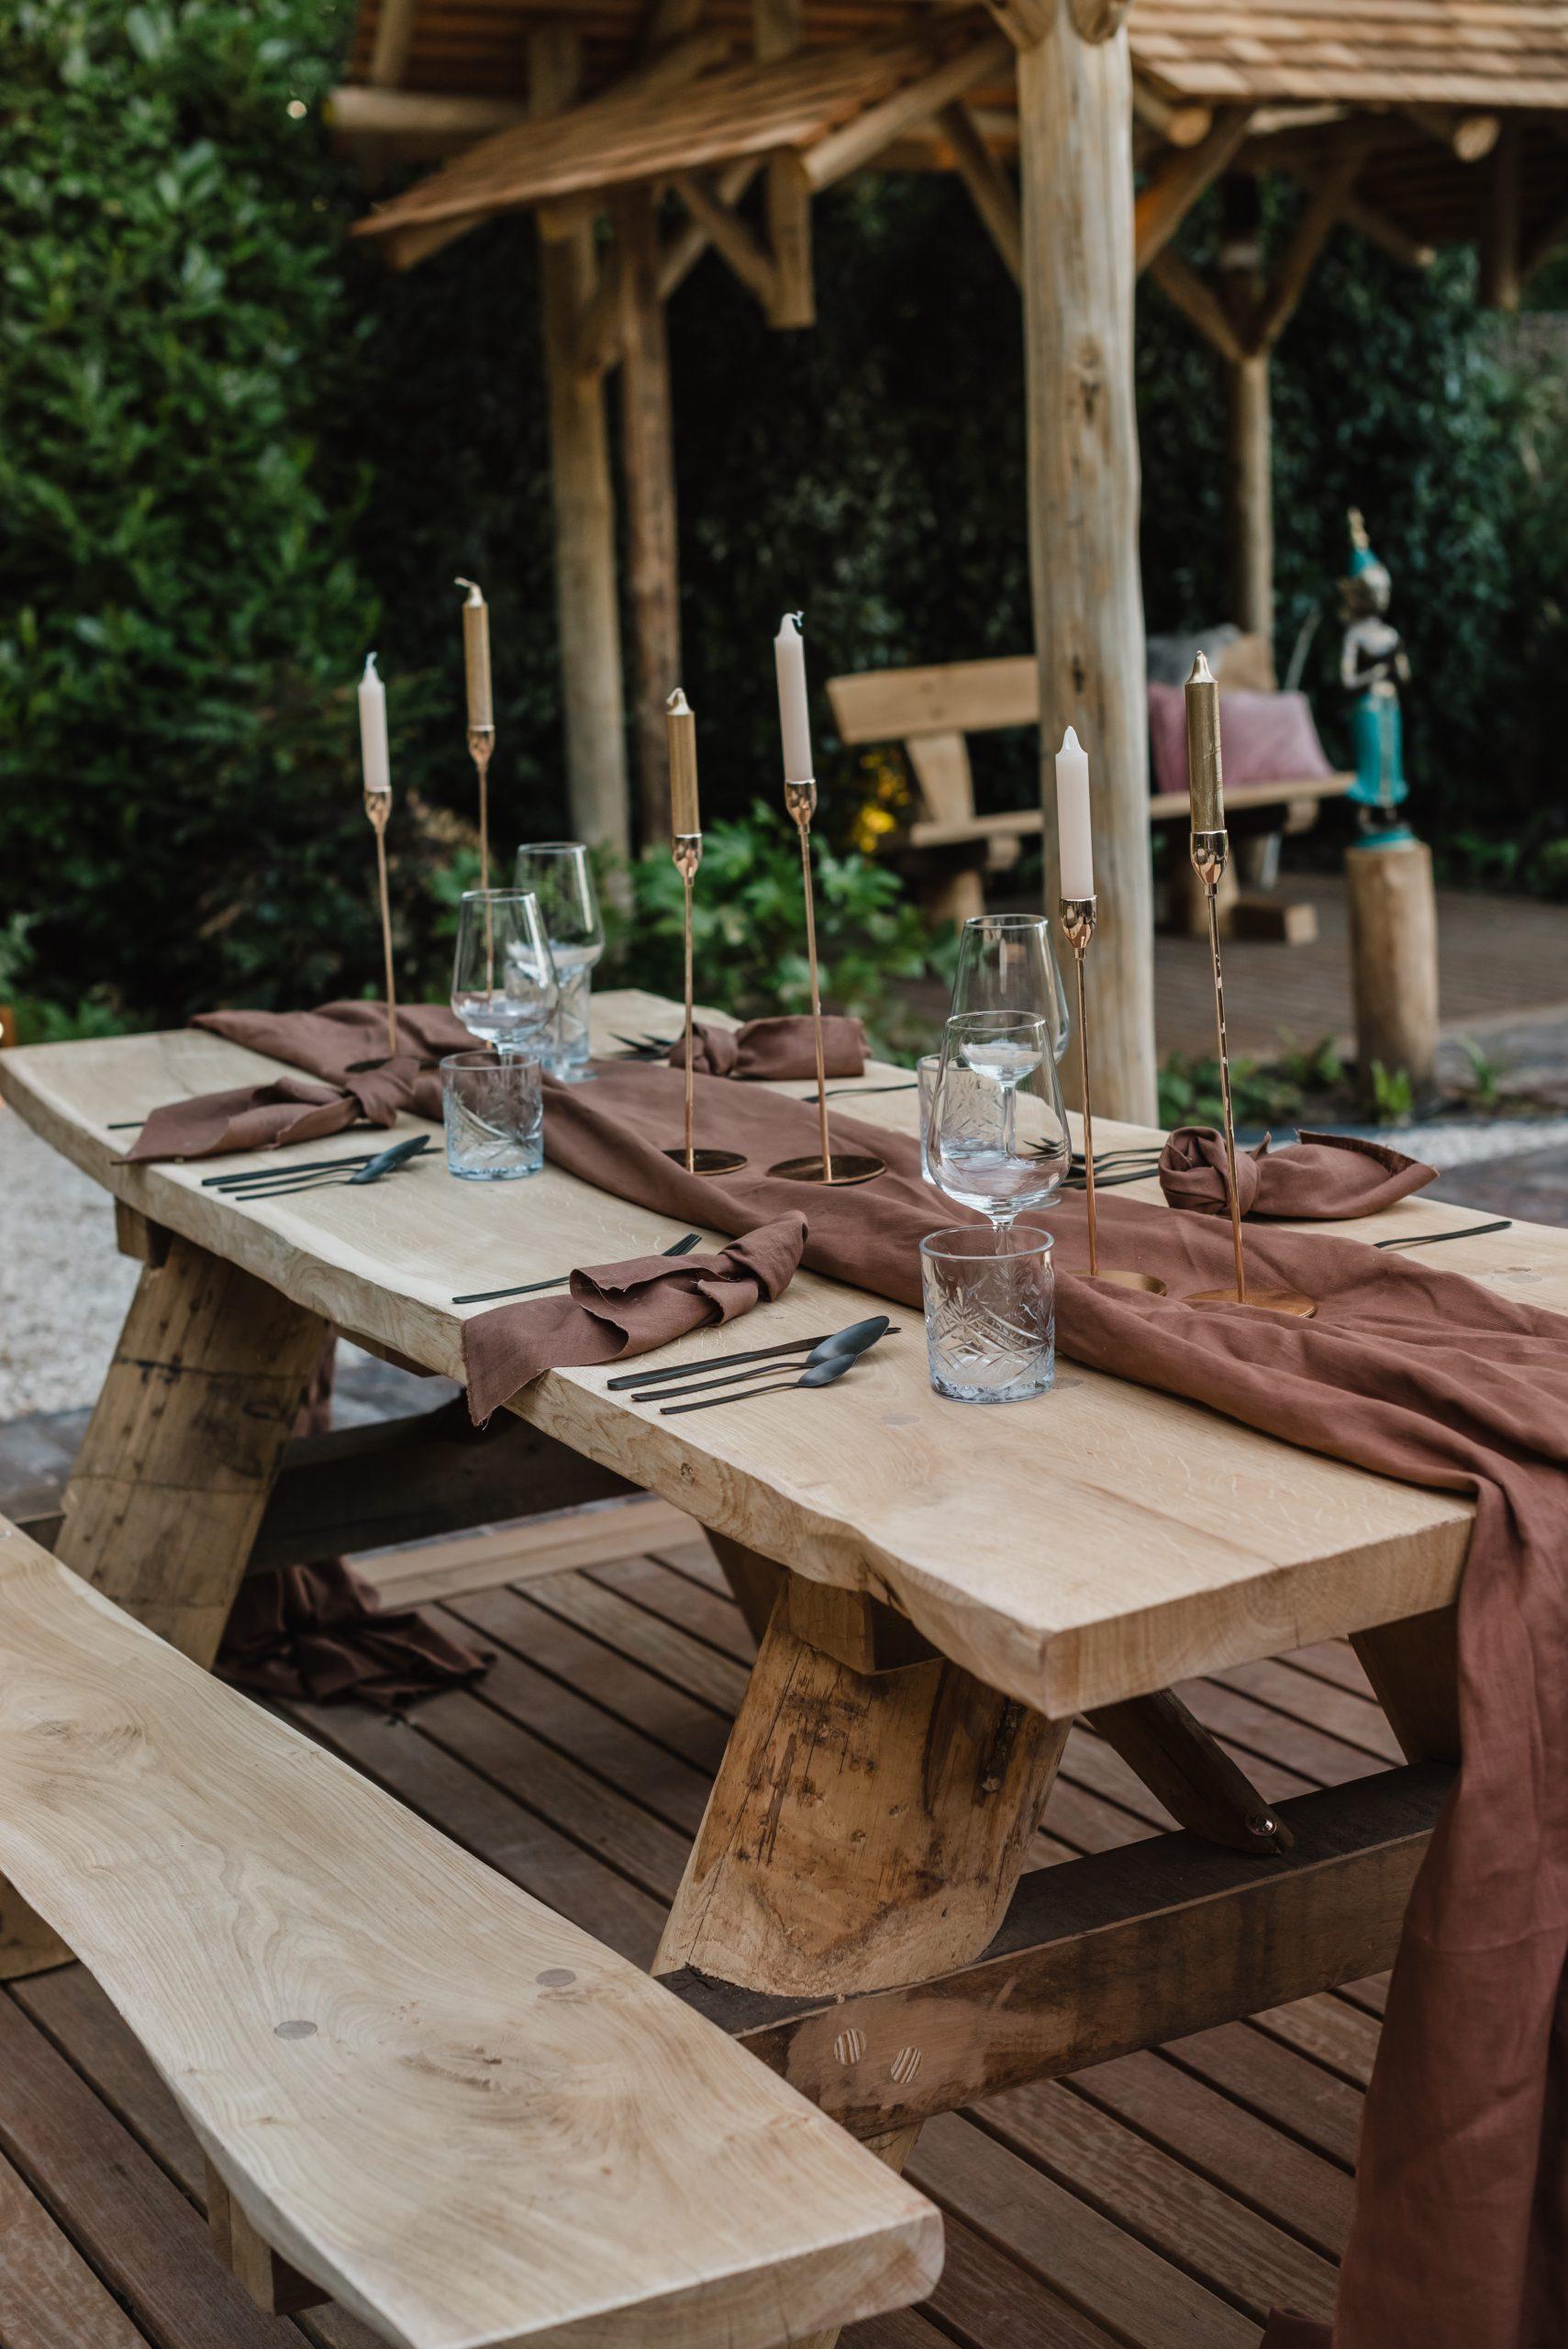 picknicktafel kopen | mooie picknicktafels | sfeervol buitenmeubiliair